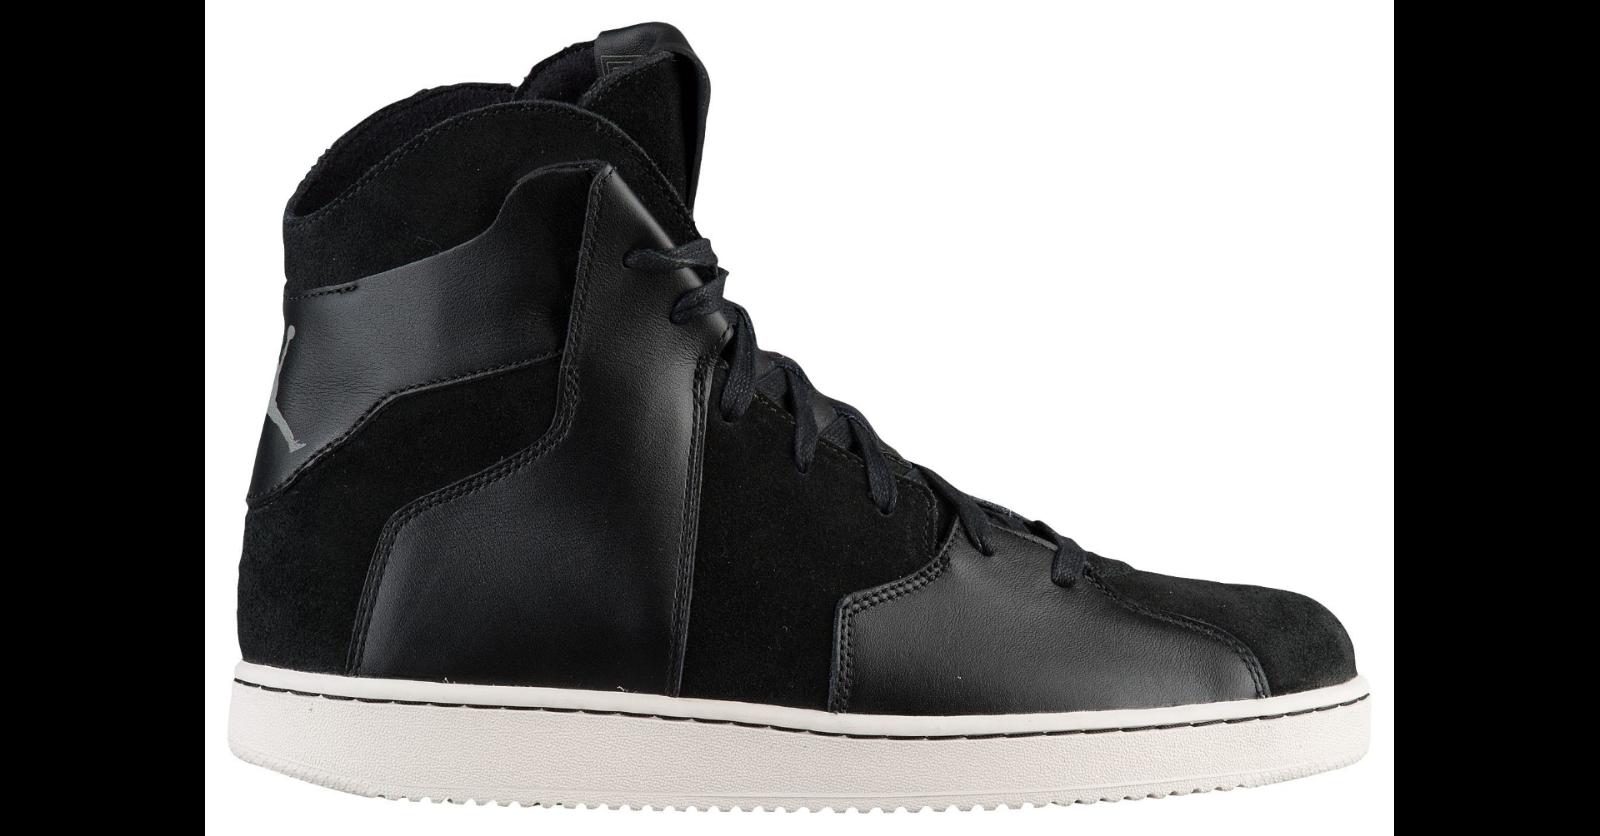 Jordan Westbrook 0.2 Black 854563-004 Why and 50 similar items. 57 419f2adf5